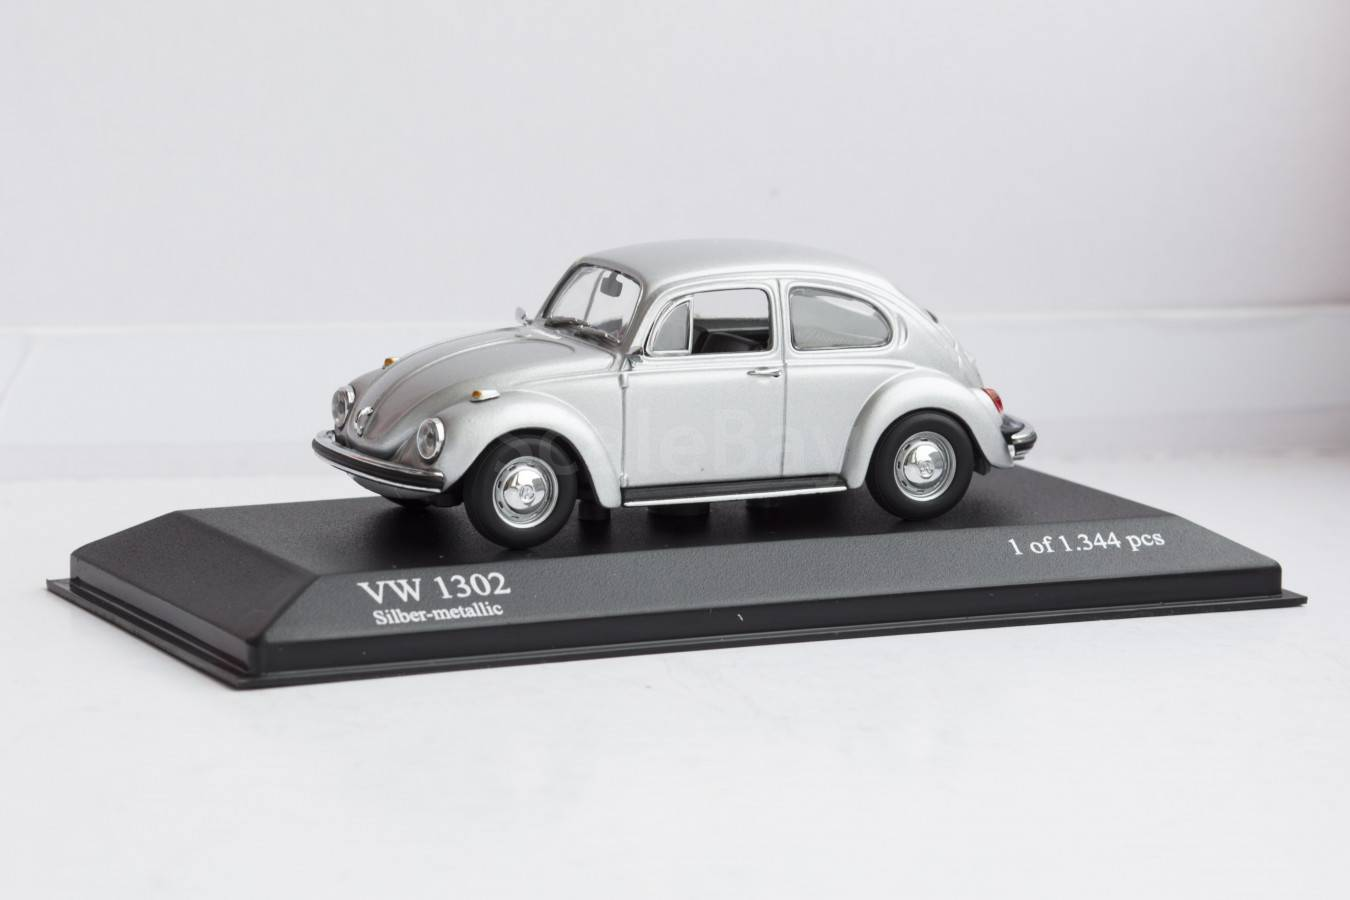 VW 1302, масштабная модель, Volkswagen, Minichamps, 1:43, 1/